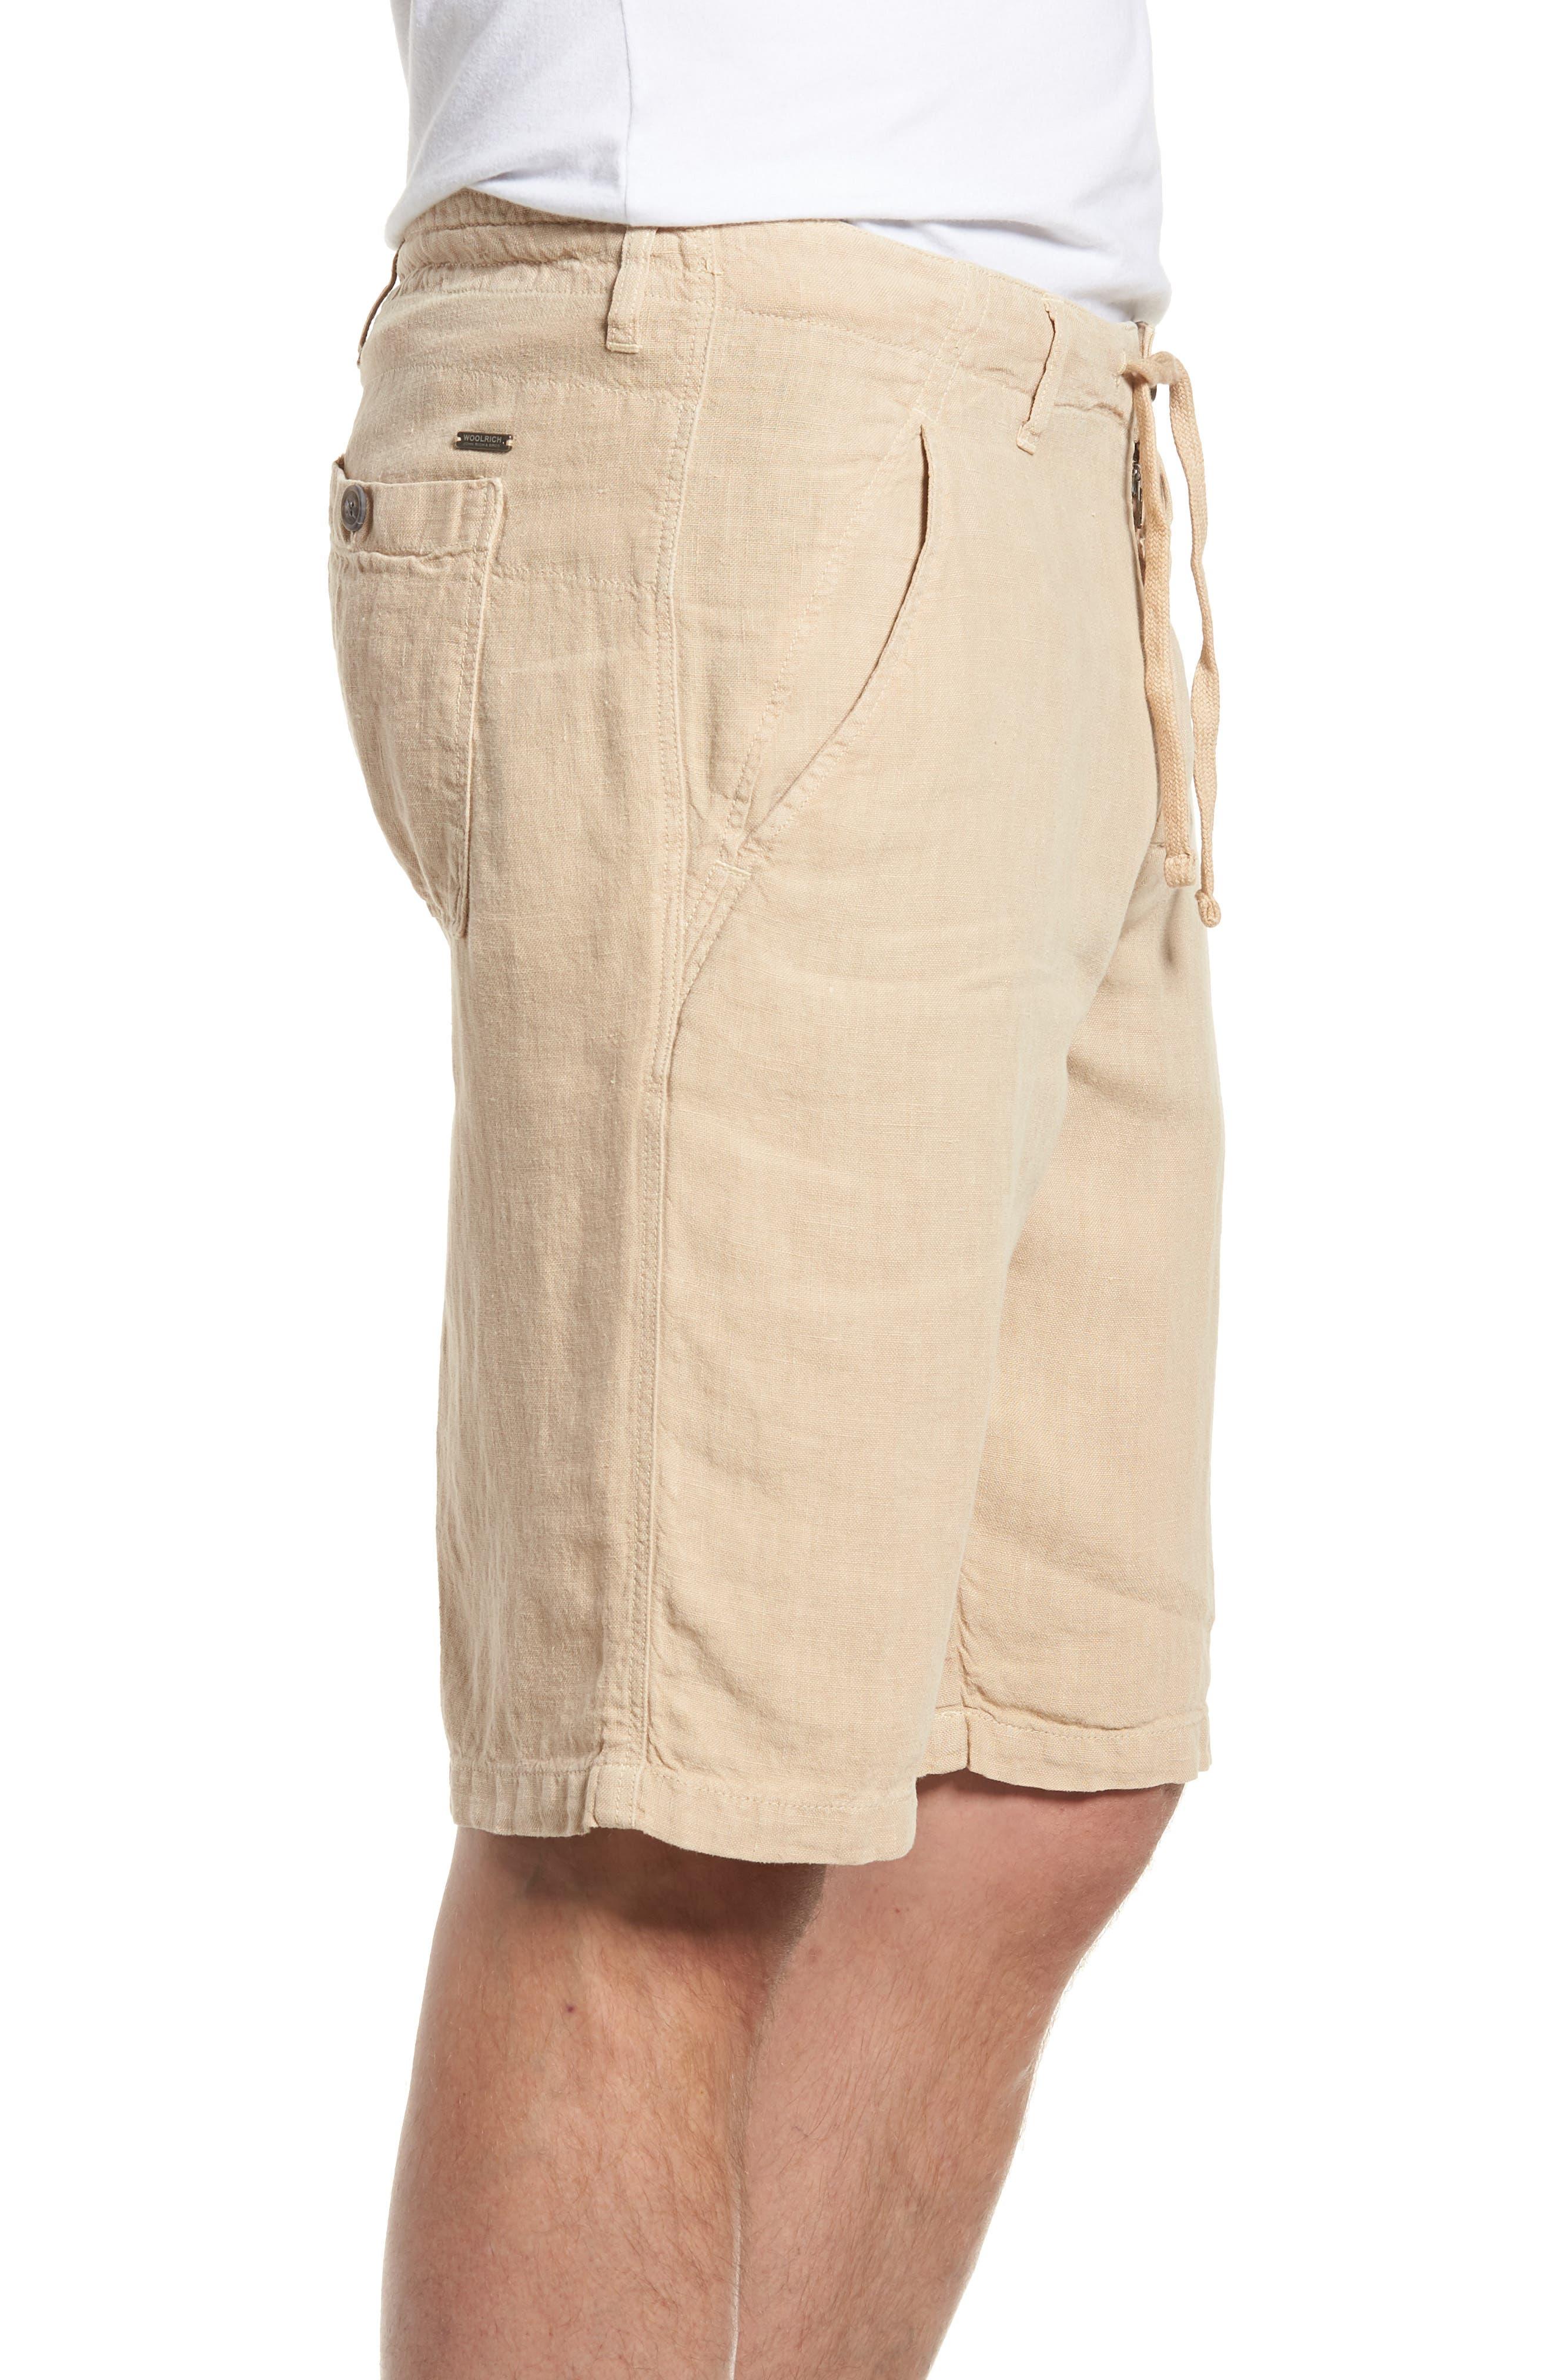 & Bros. Linen Shorts,                             Alternate thumbnail 3, color,                             200